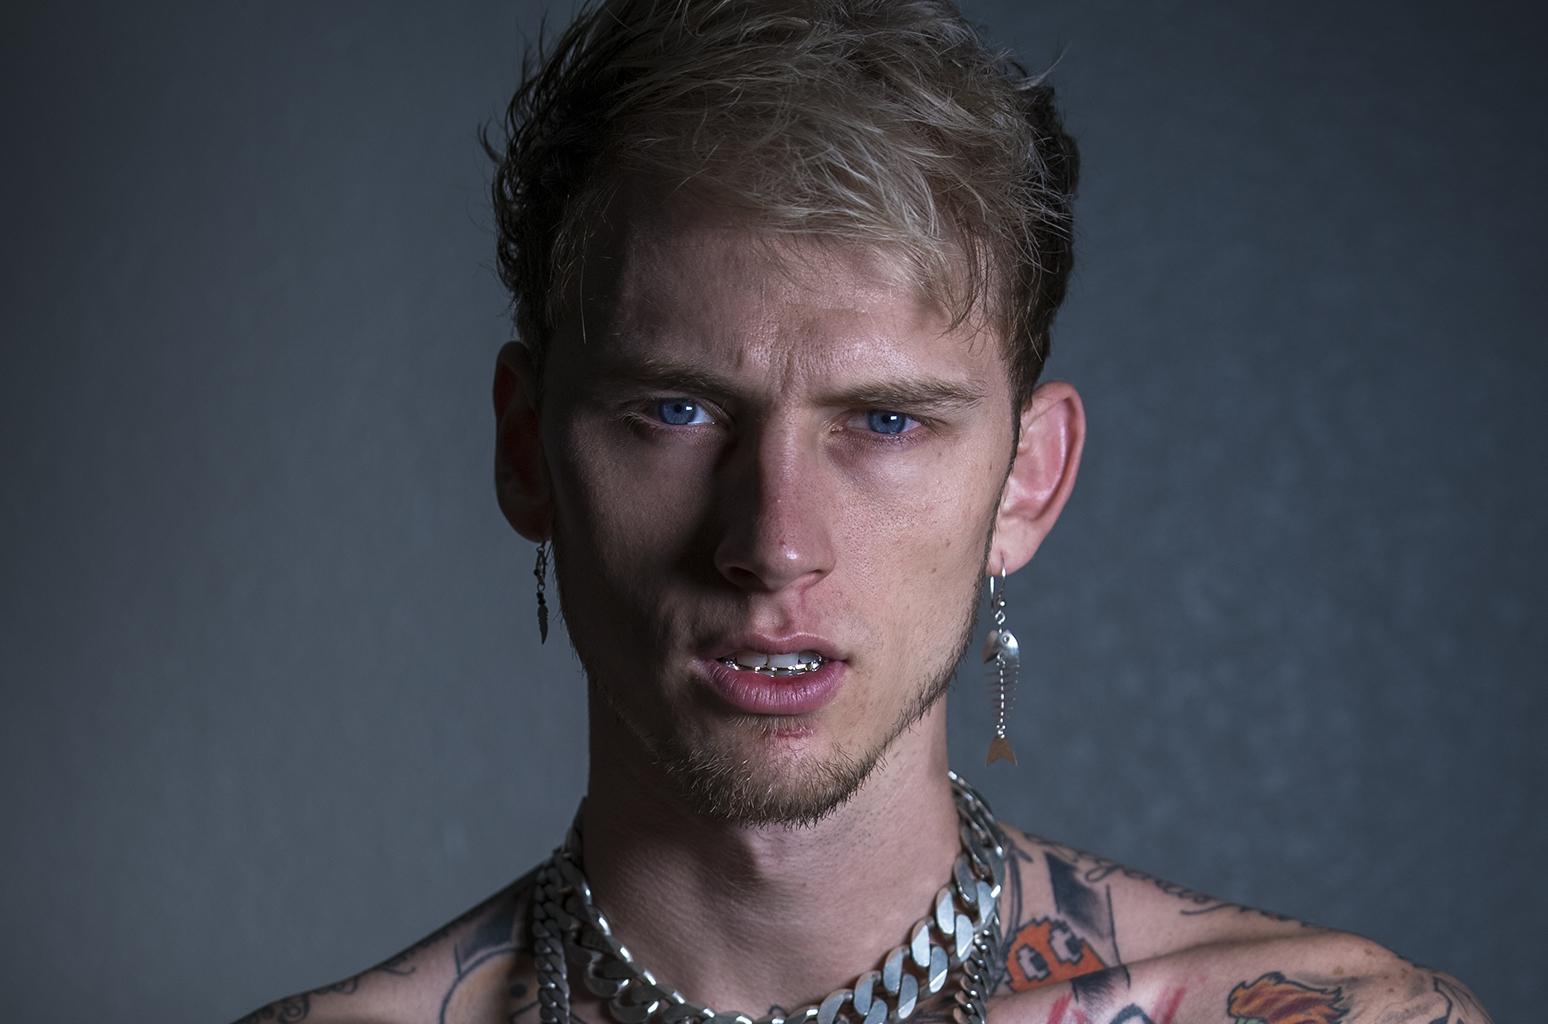 Machine gun kelly live in de oosterpoort groningen for Full body tattoo porn